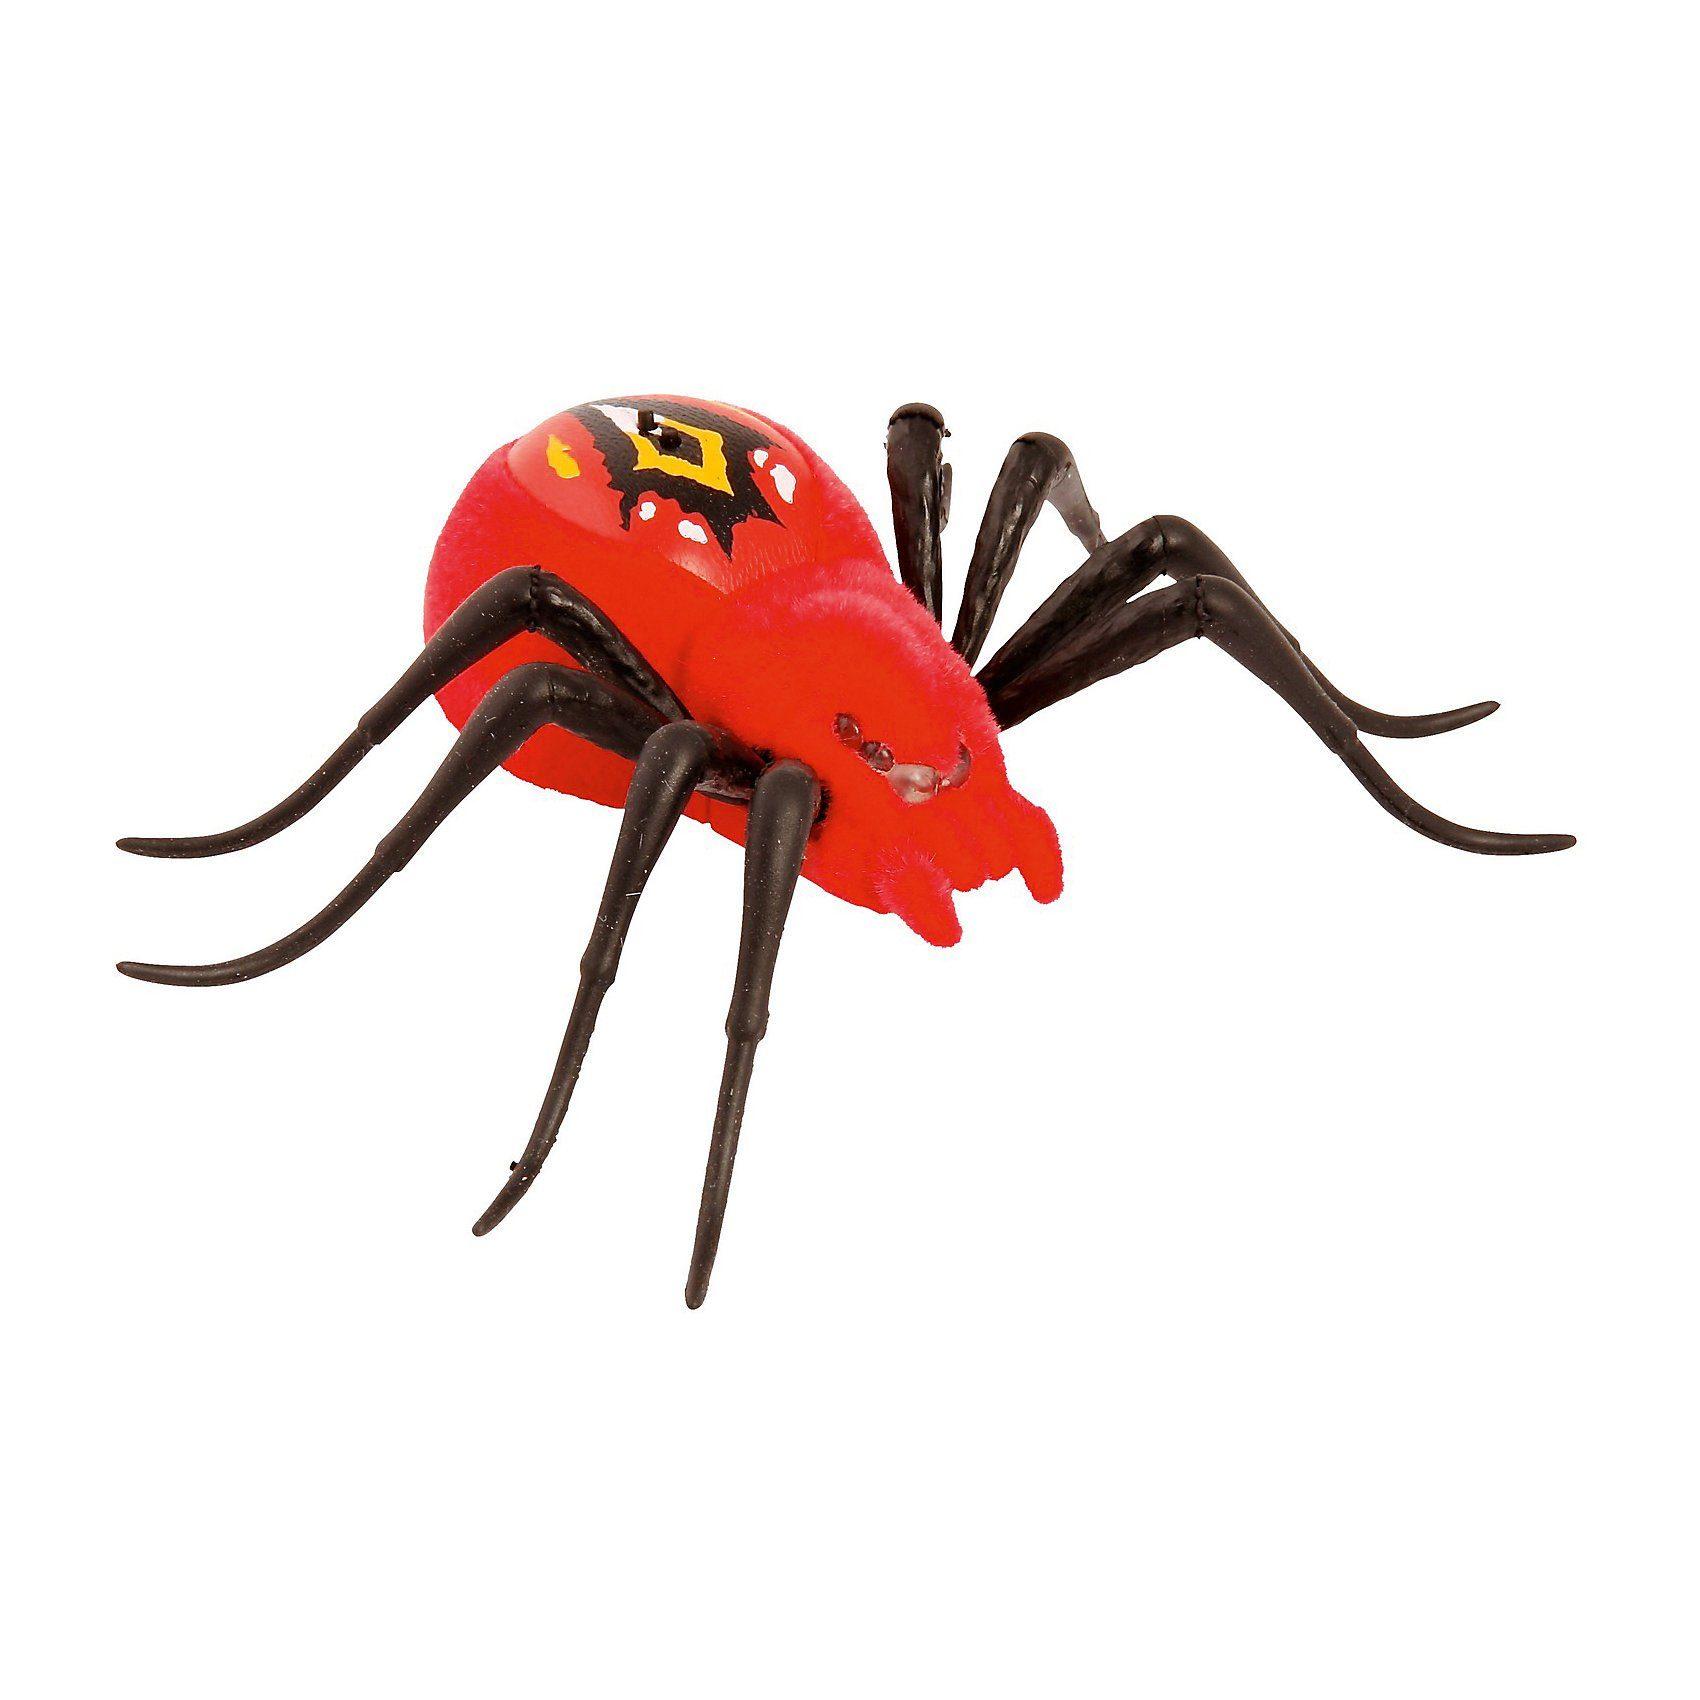 BOTI WILD PETS S1 Spinne rot